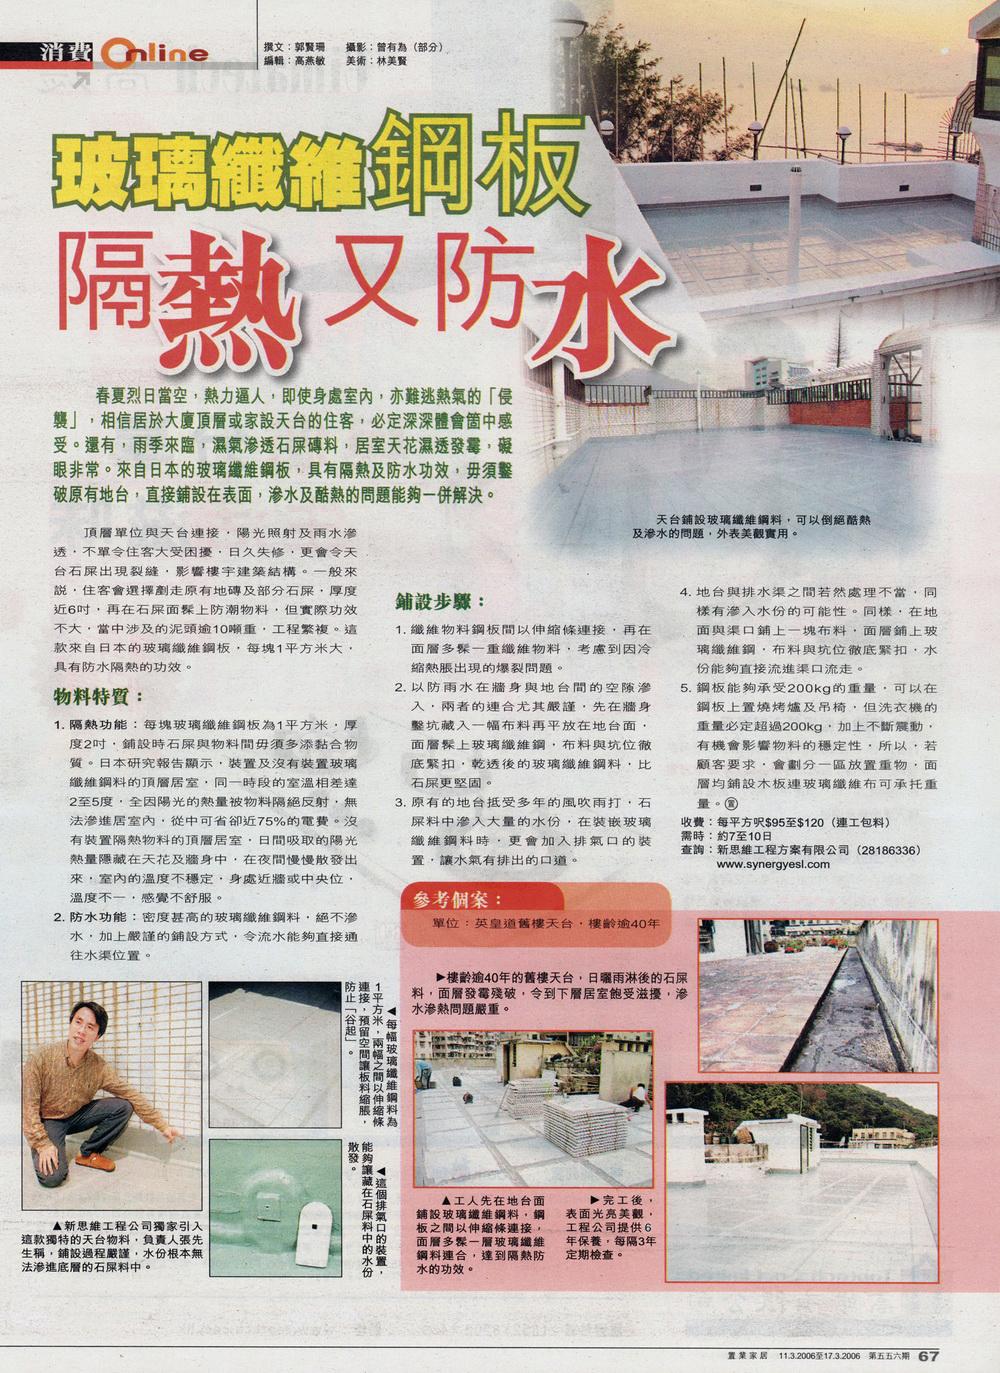 Fiberglass: Heat insulation and Waterproofing